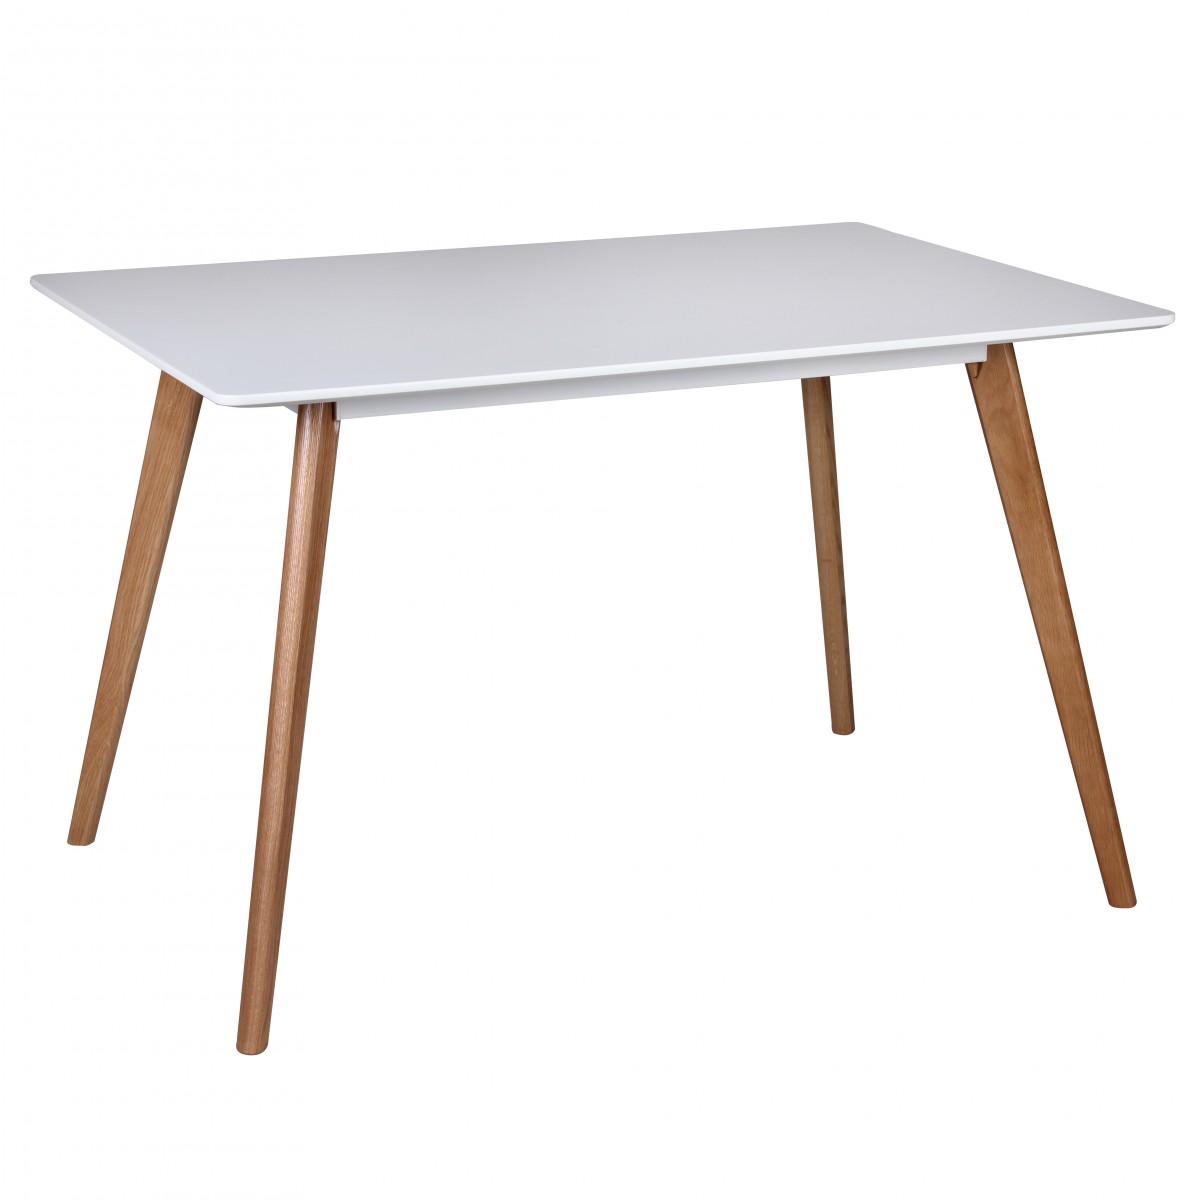 Jídelní stůl Scanio, 120 cm, bílá/dub